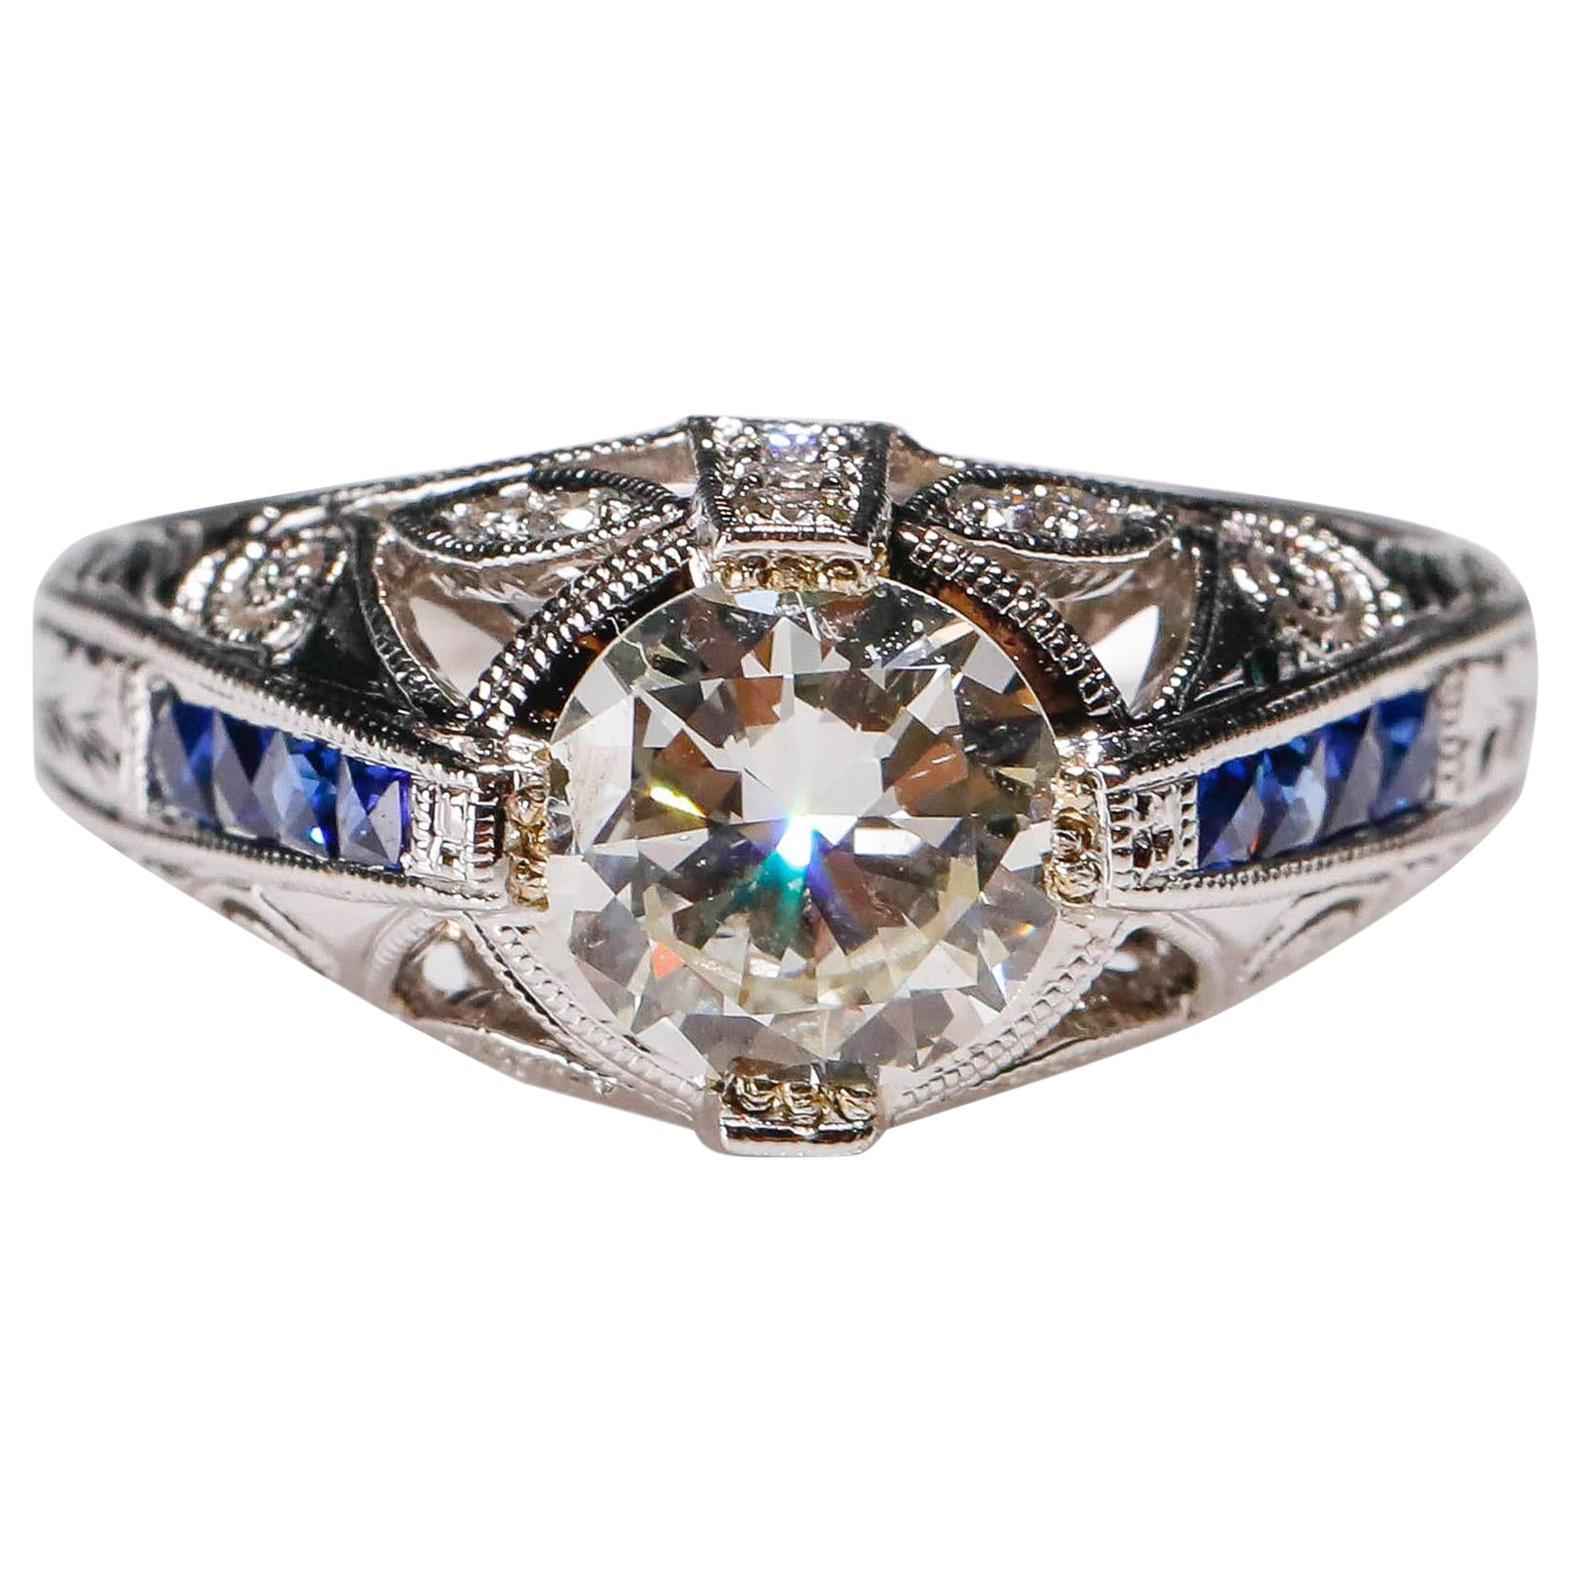 1.27 Carat Diamond and Sapphire Halo Ring 18 Karat White Gold Fine